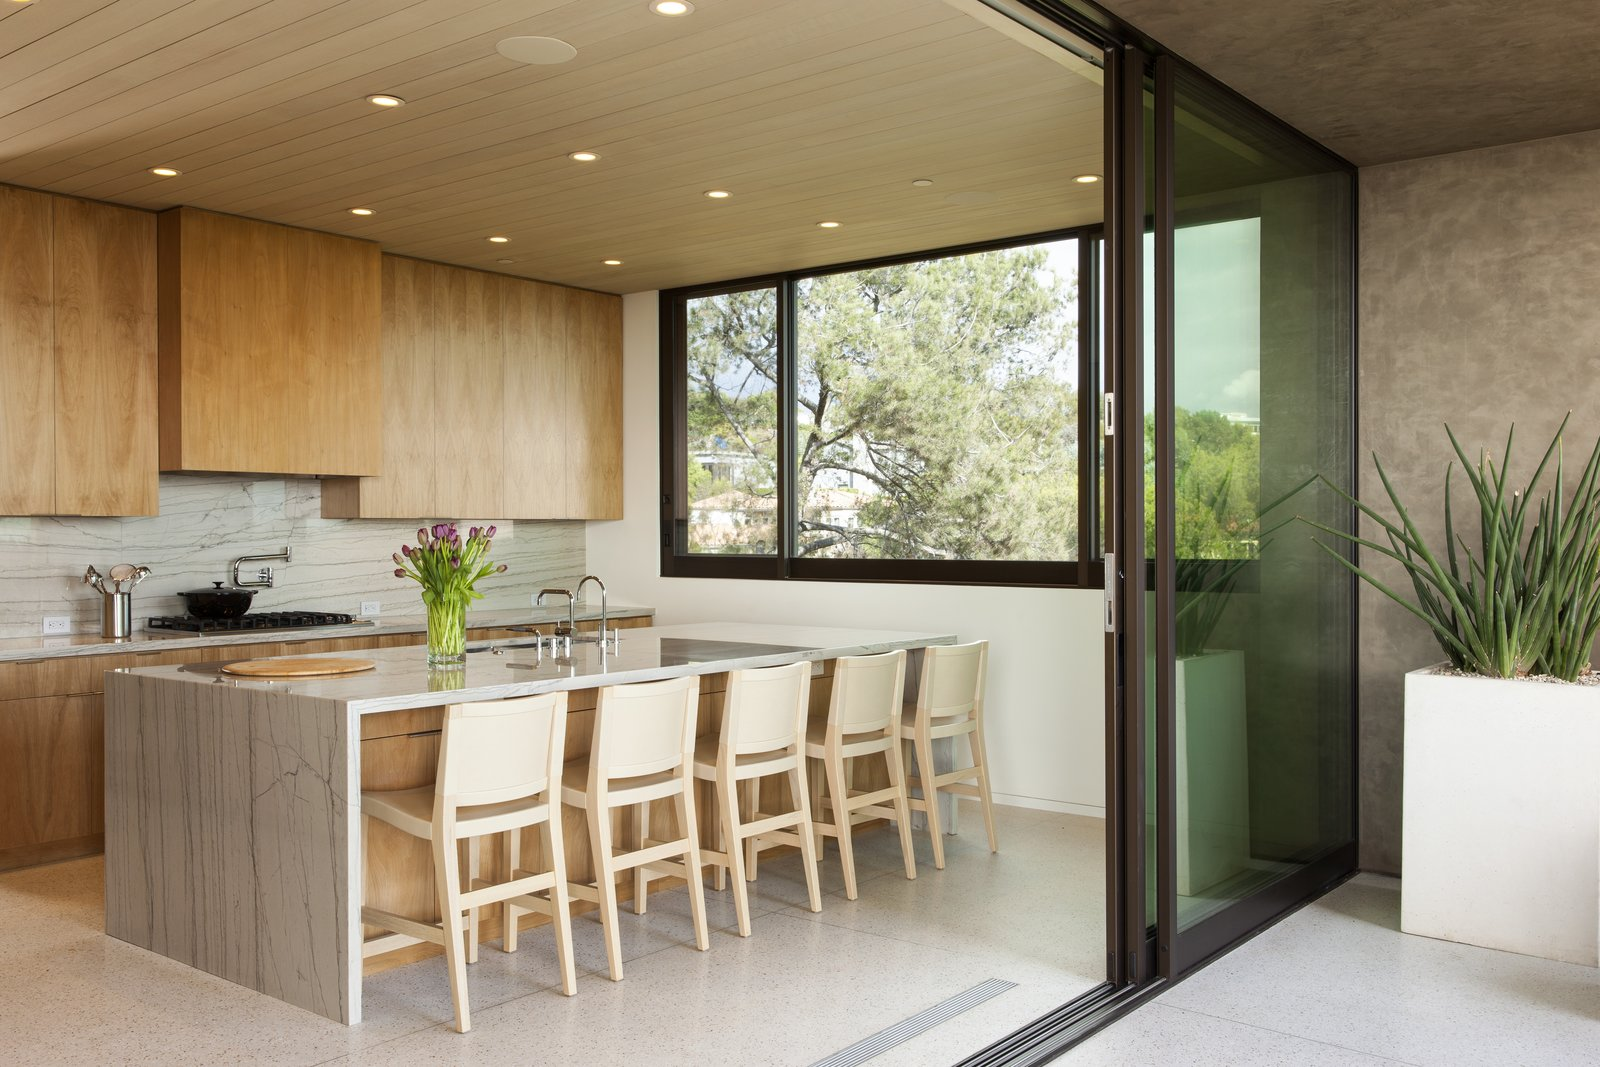 Kitchen, Marble Counter, Wood Cabinet, Terrazzo Floor, Marble Backsplashe, Recessed Lighting, Cooktops, and Drop In Sink  Summitridge by Marmol Radziner